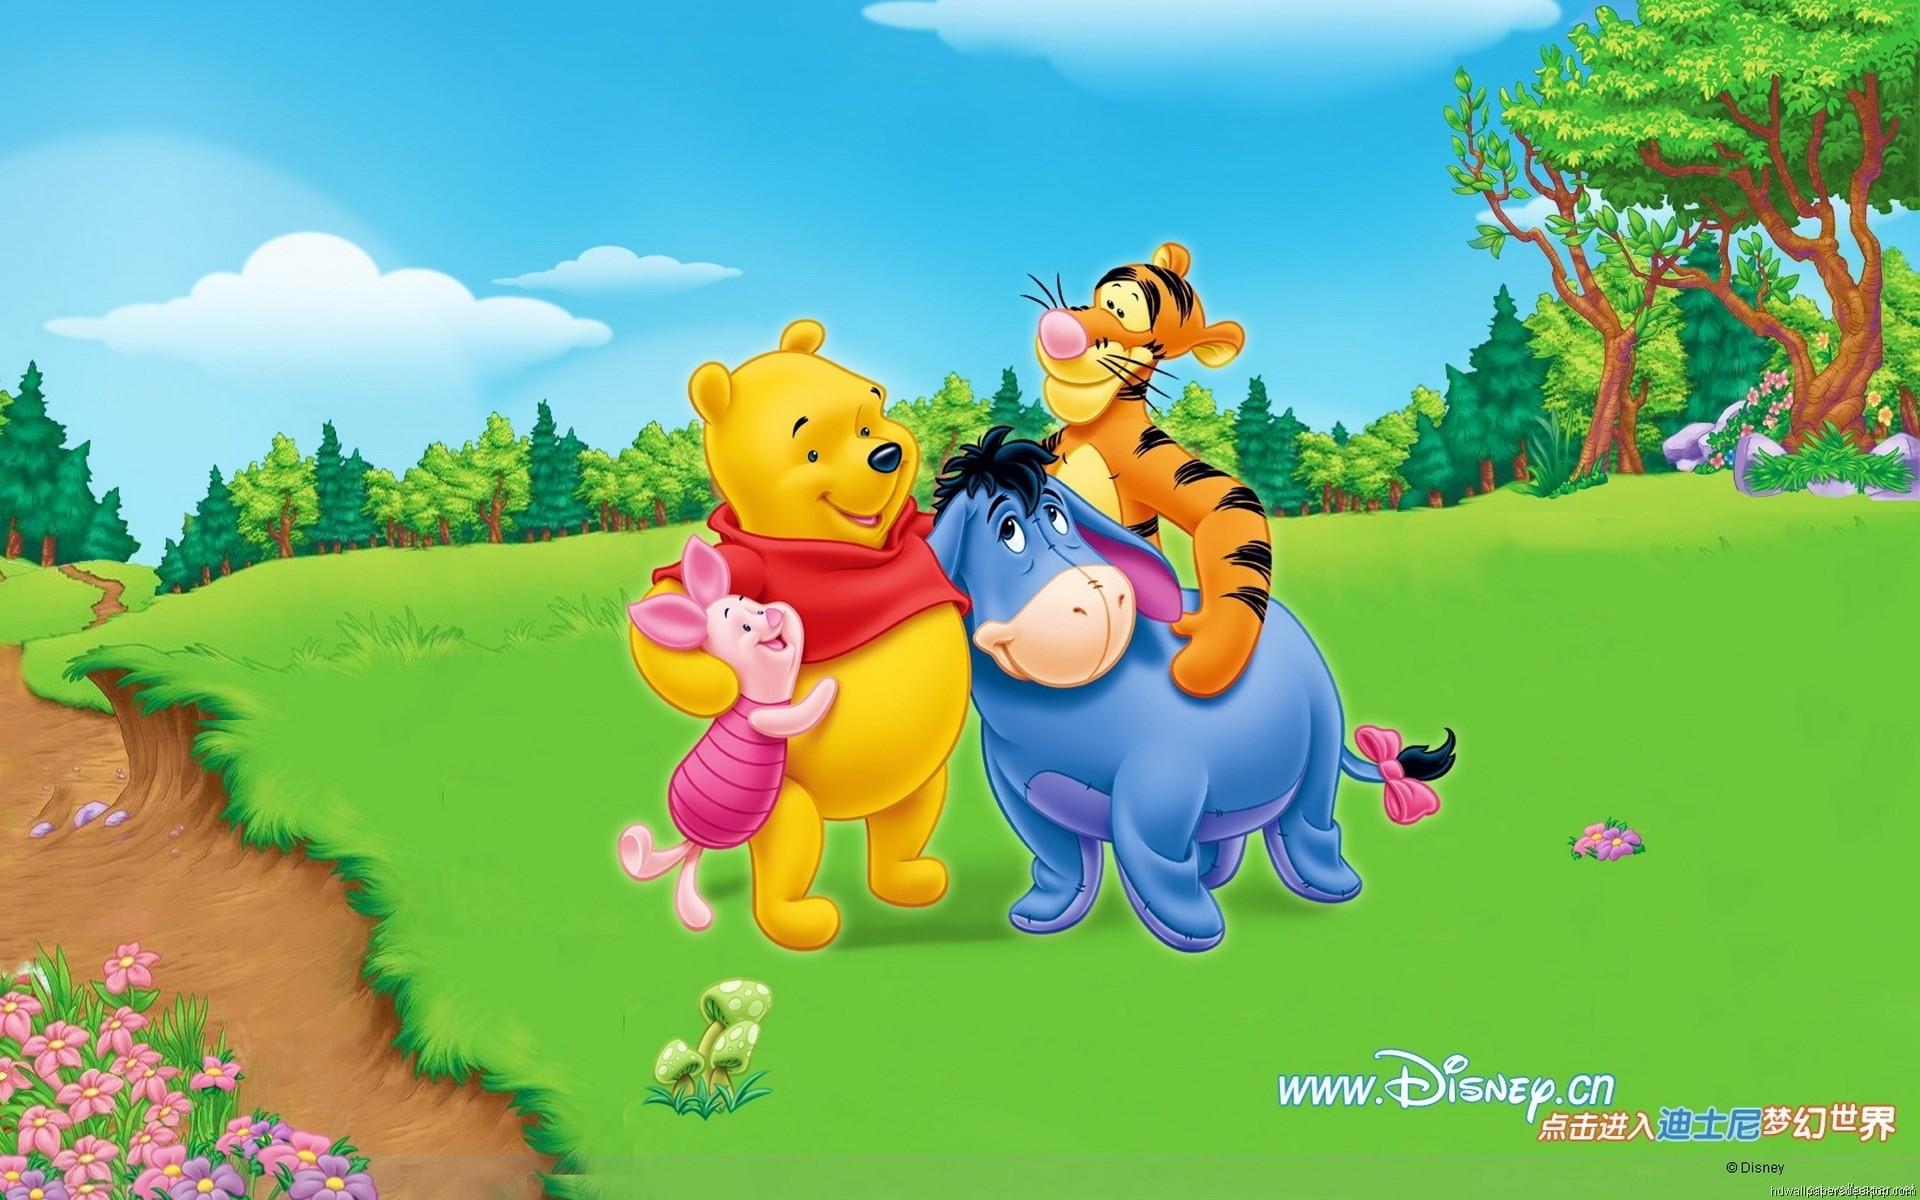 Walt Disney Winnie The Pooh Wallpaper #9475 Wallpaper | Cool .